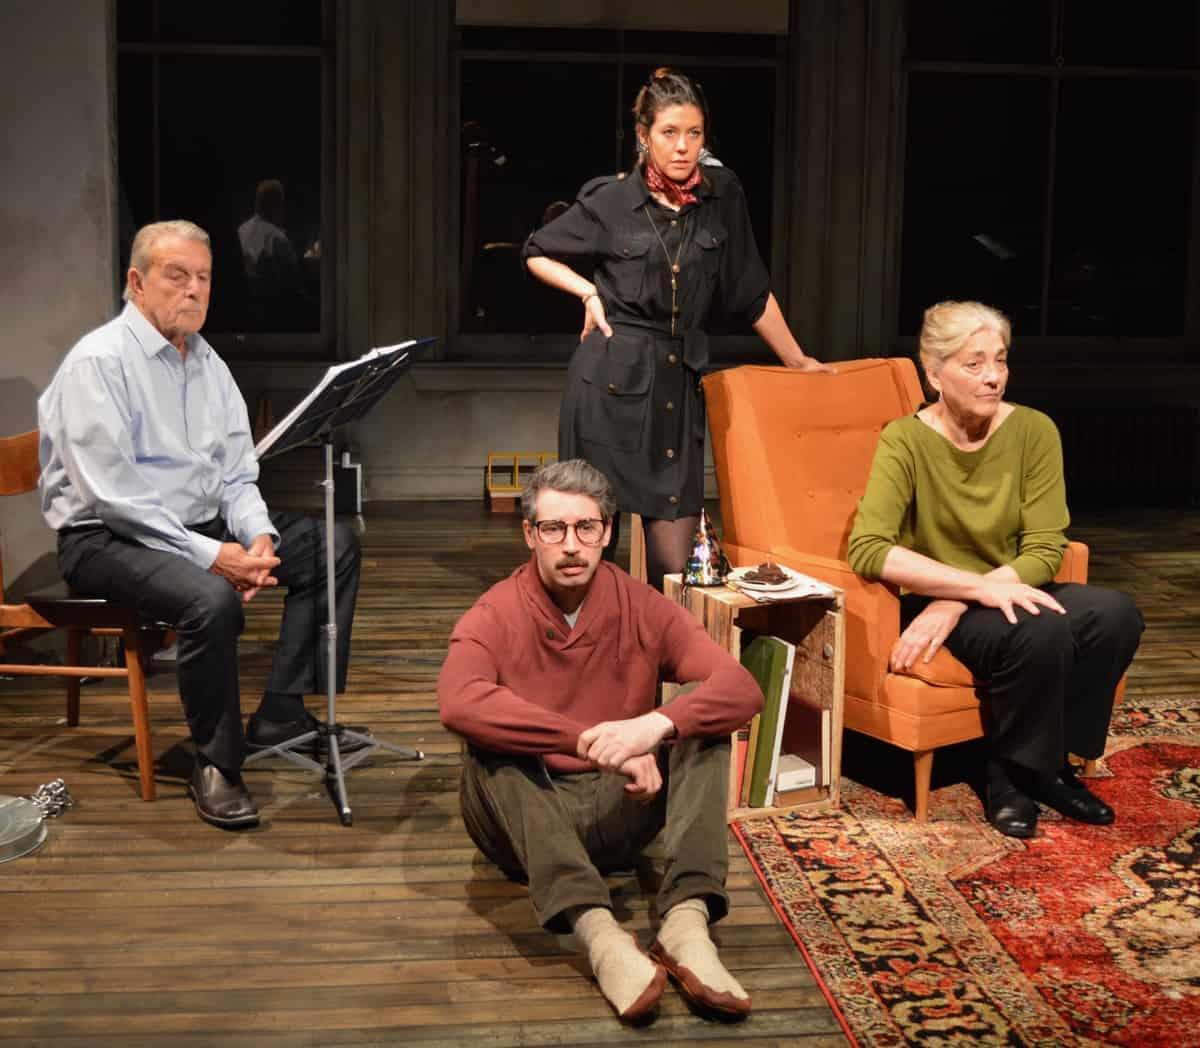 Magic Theatre Review: Reel to Reel by John Kolvenbach